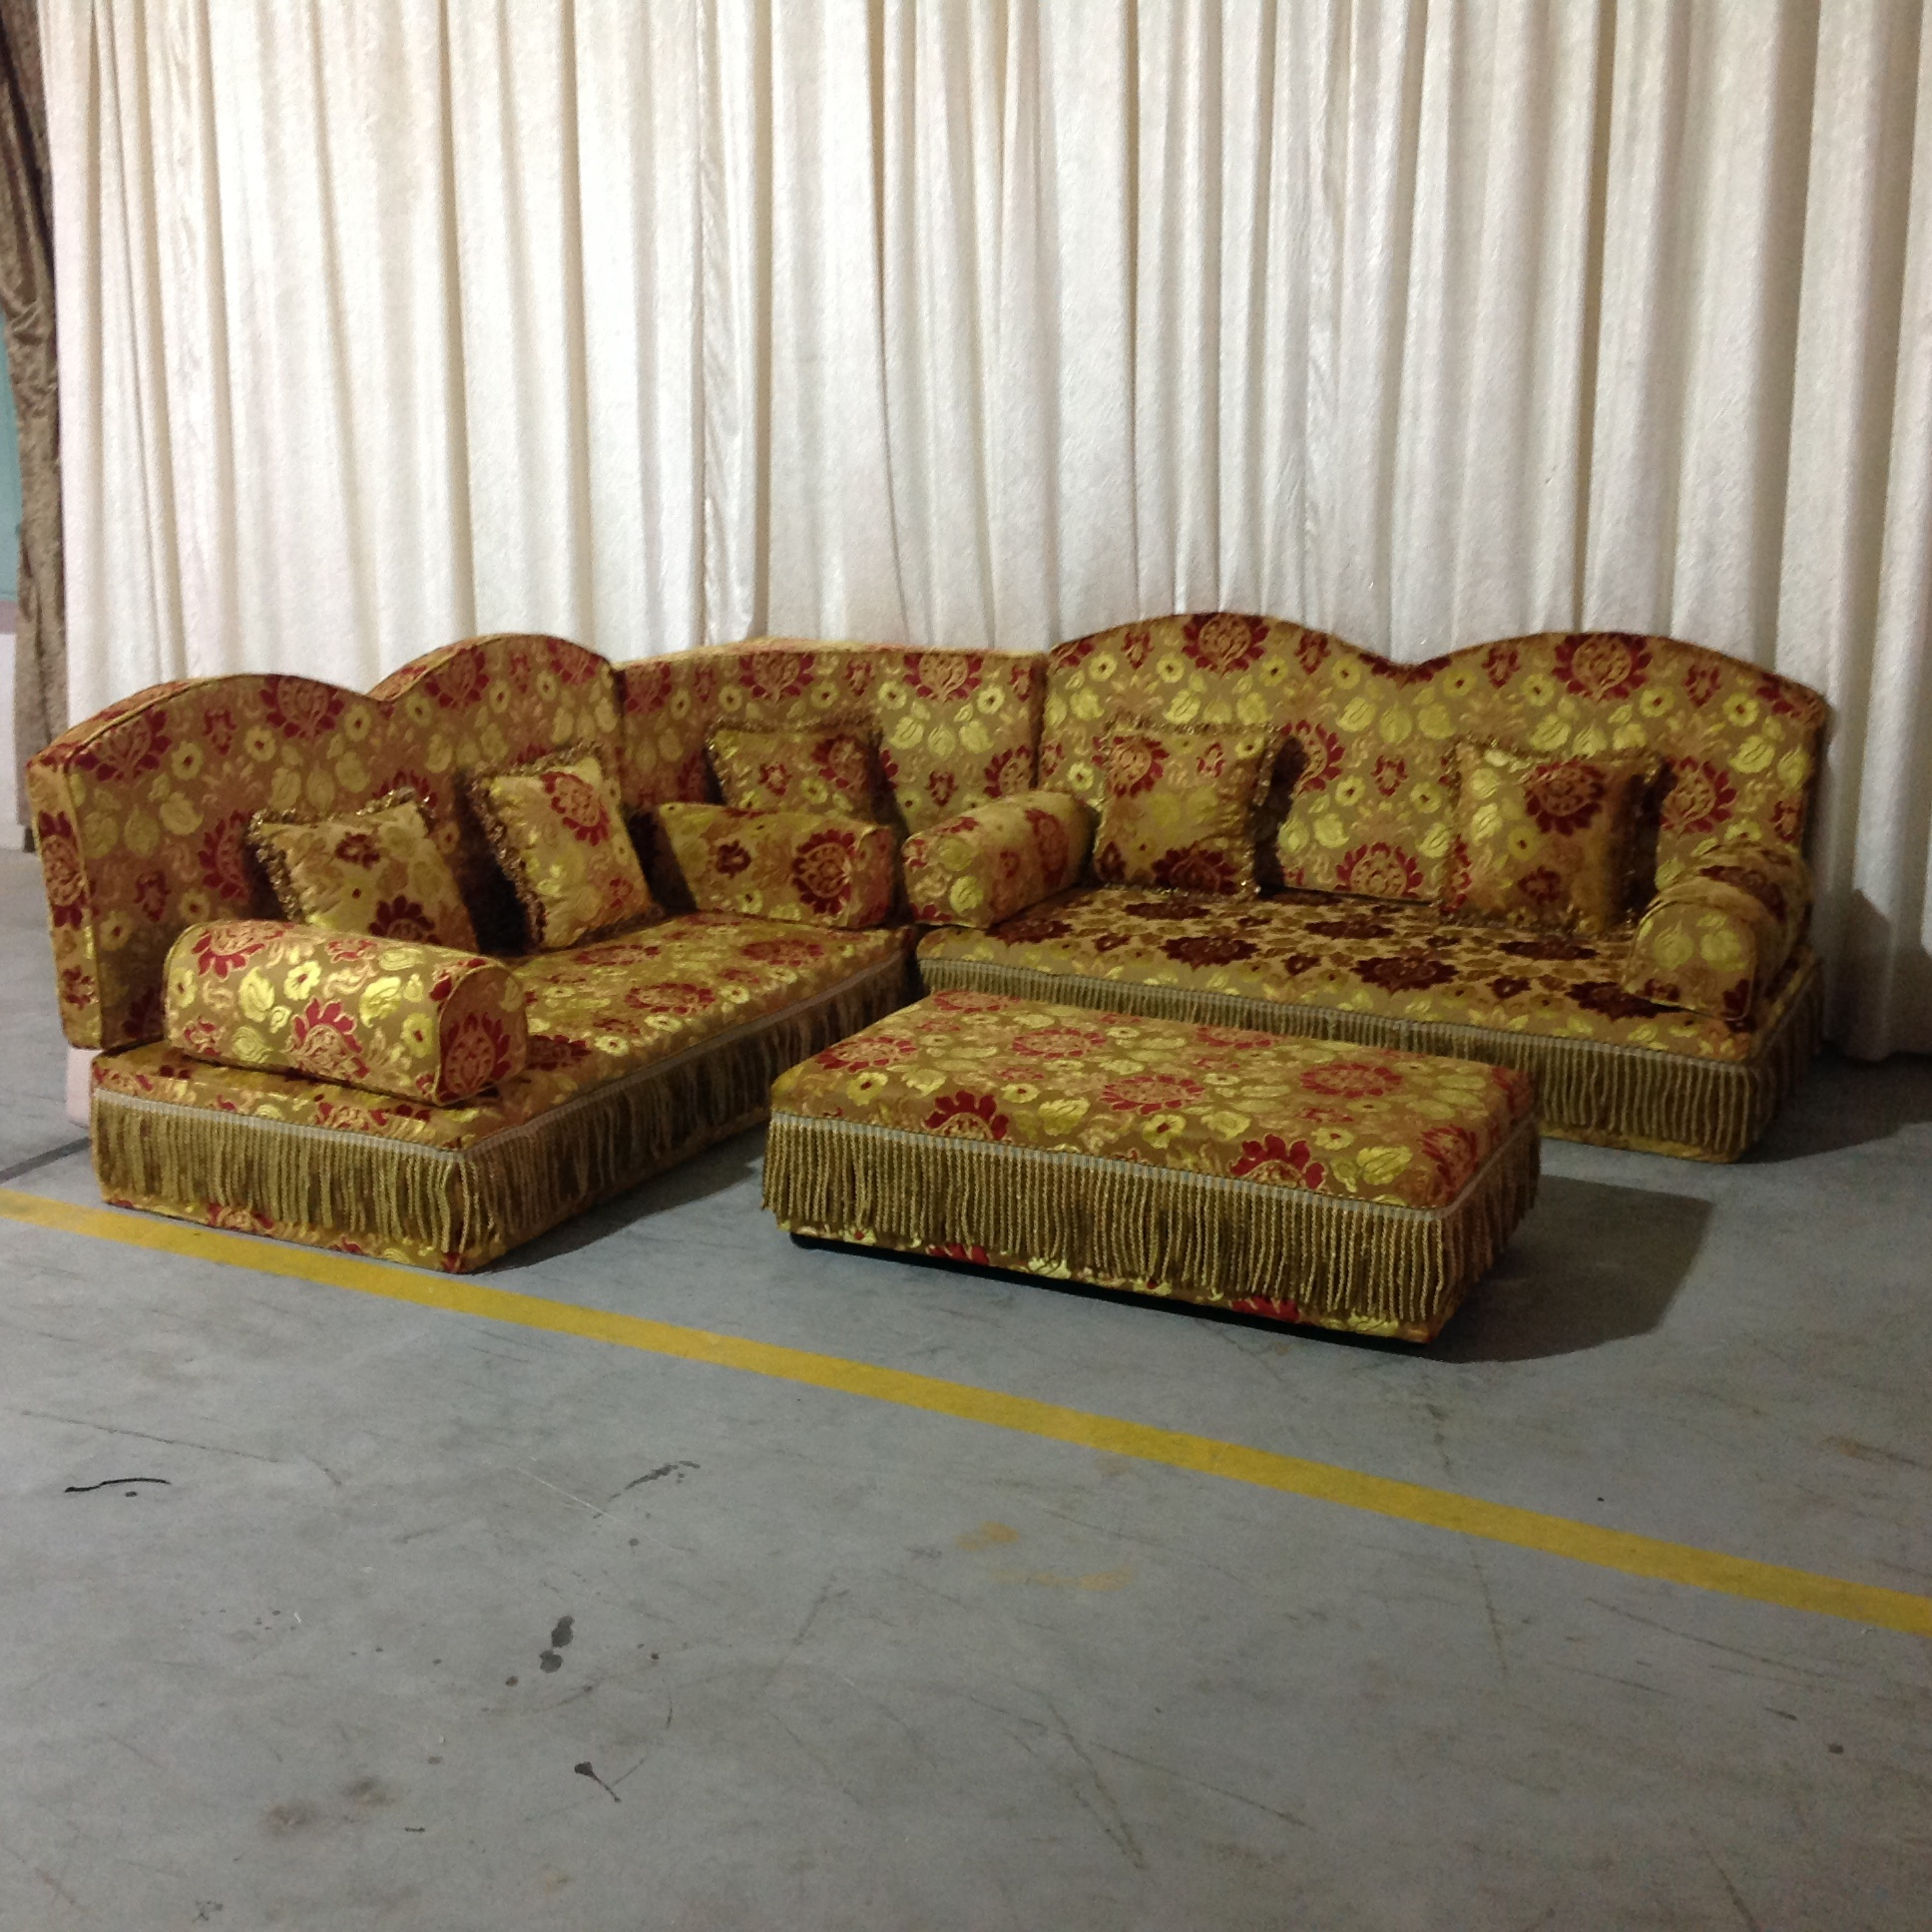 Prime Danxueya Arabic Sofa Sets Arab Floor Sofa Majlis Saudi Arabia Sofa Buy Arabic Sofa Sets Arab Floor Sofa Majlis Saudi Arabia Sofa Product On Machost Co Dining Chair Design Ideas Machostcouk